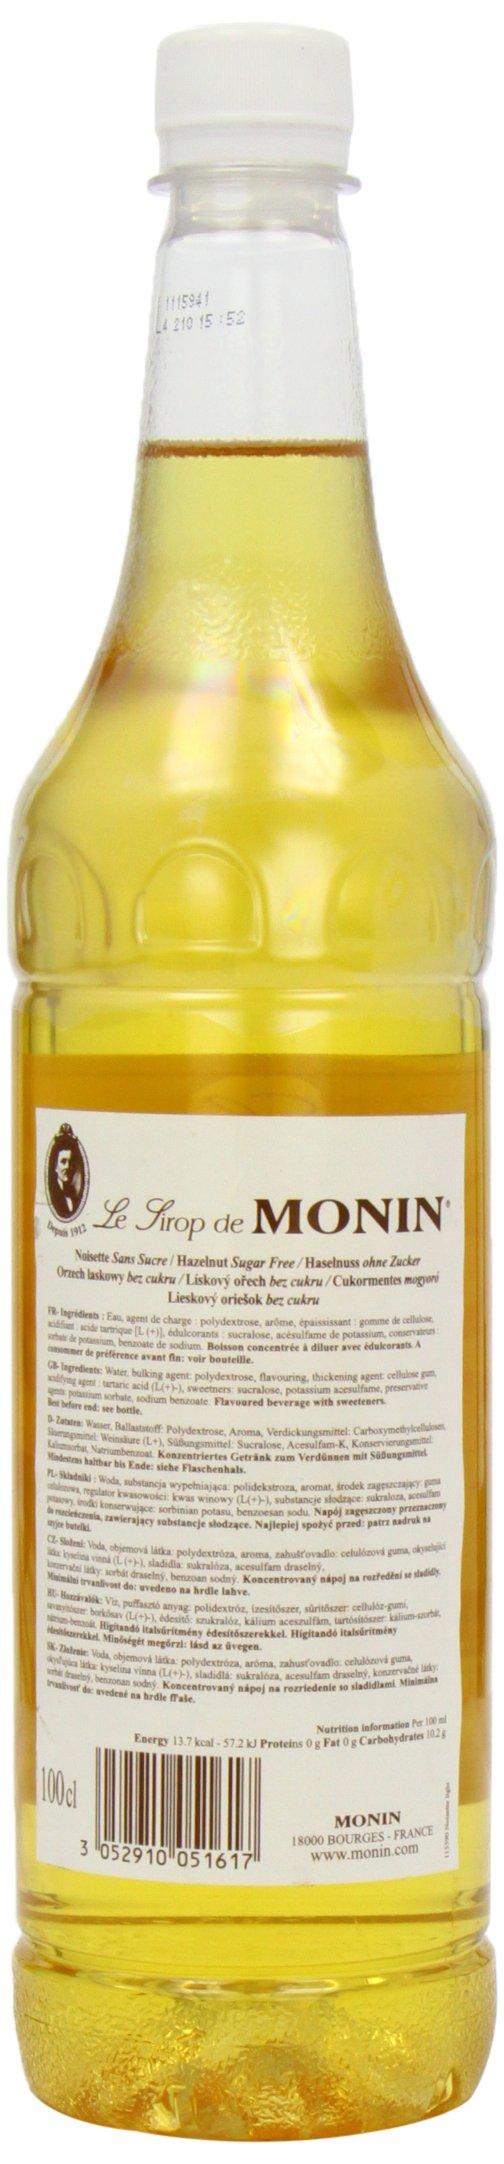 Monin-Premium-Hazelnut-Sugar-Free-Syrup-1-L